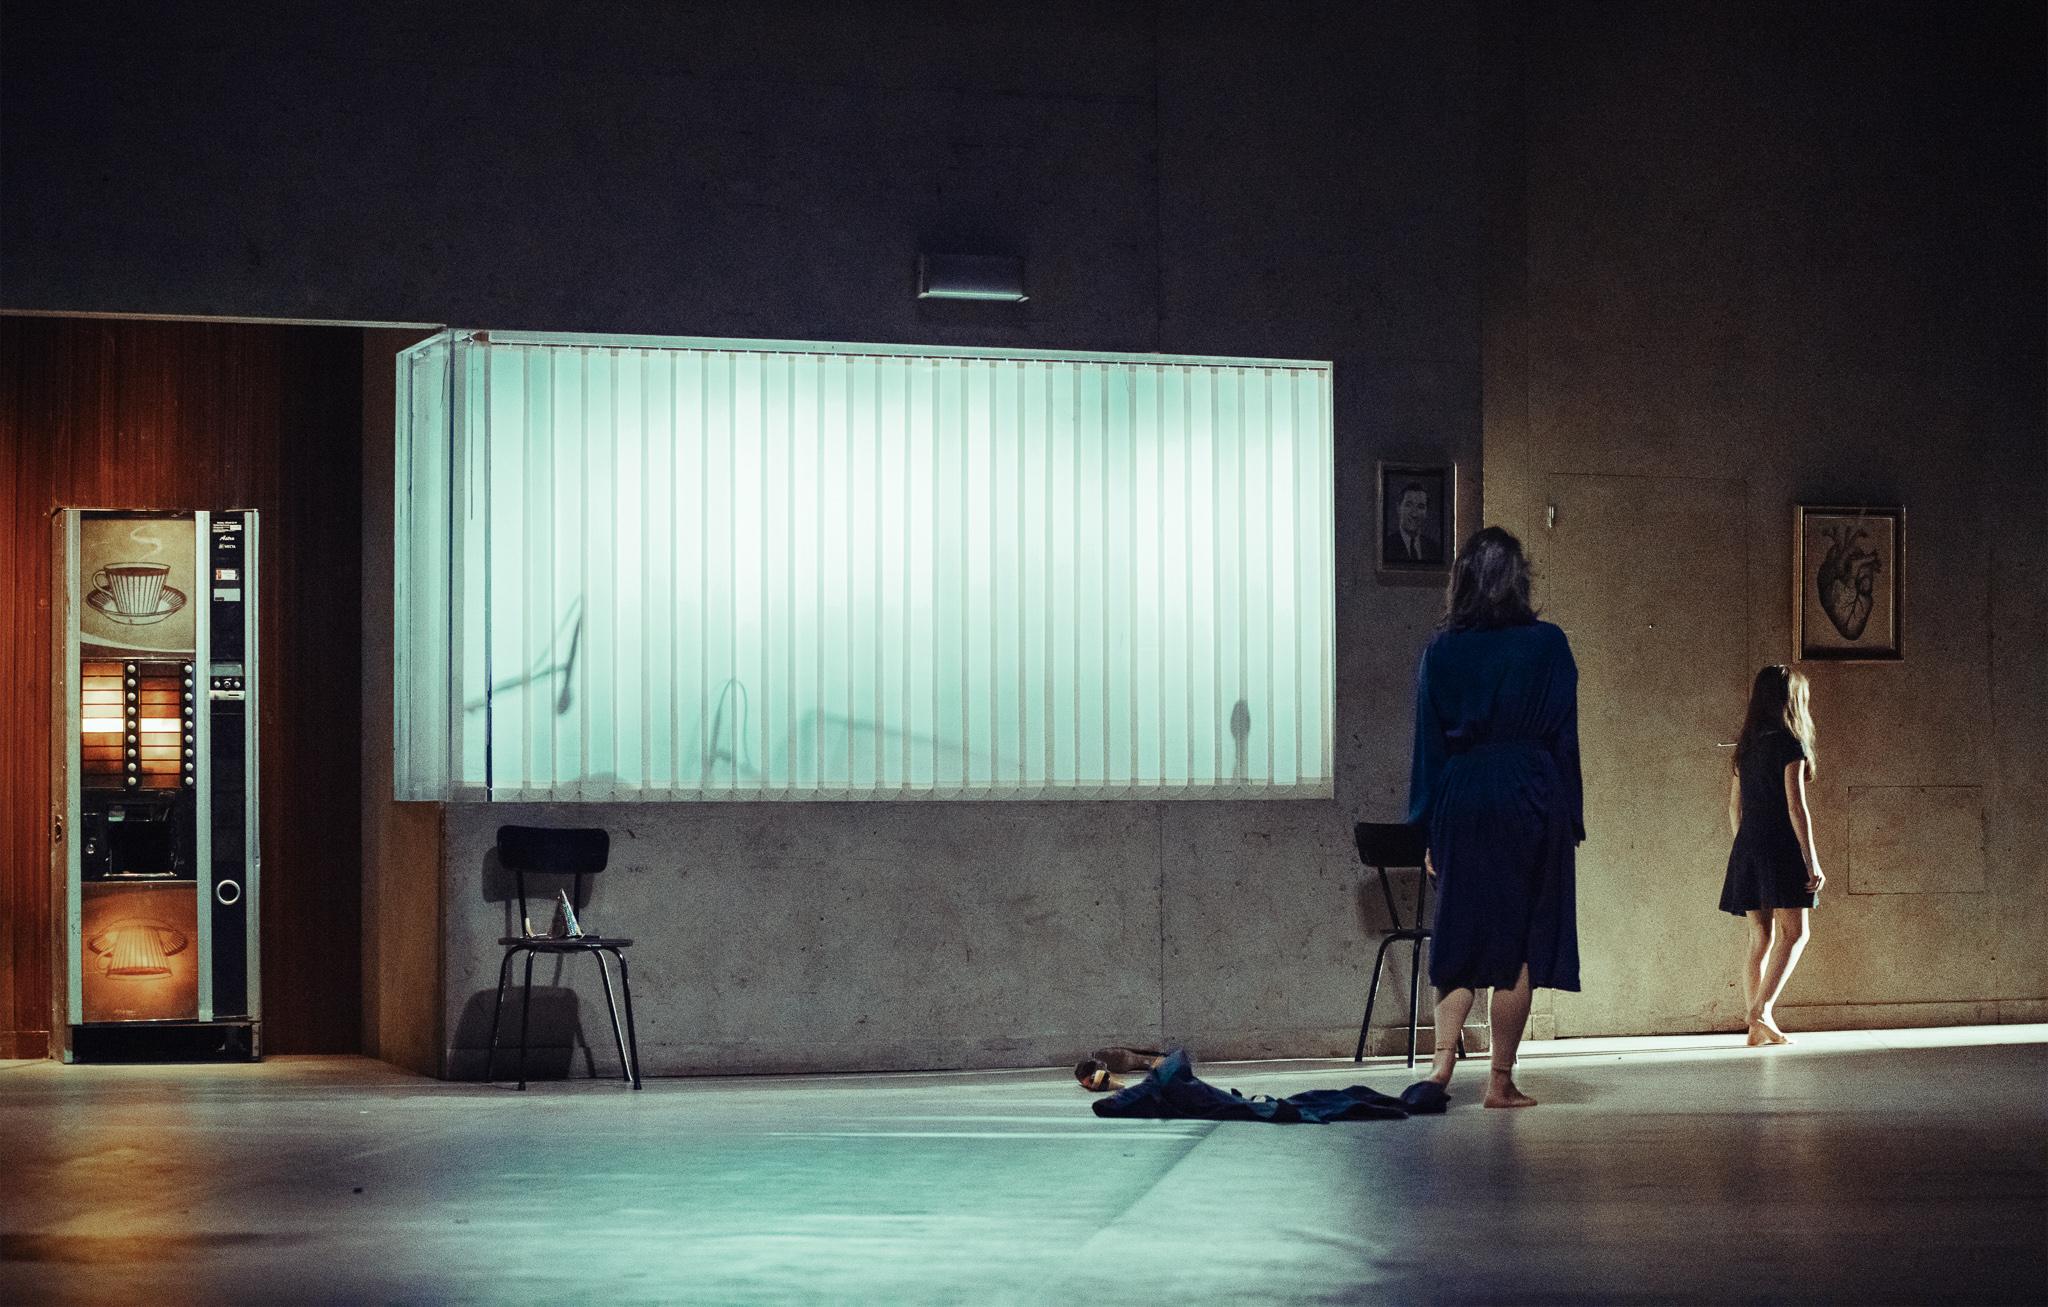 Image of Peepingtom Moeder - dance photography, fotografia de escena, fotografo de danza, dance photographer, stage photography